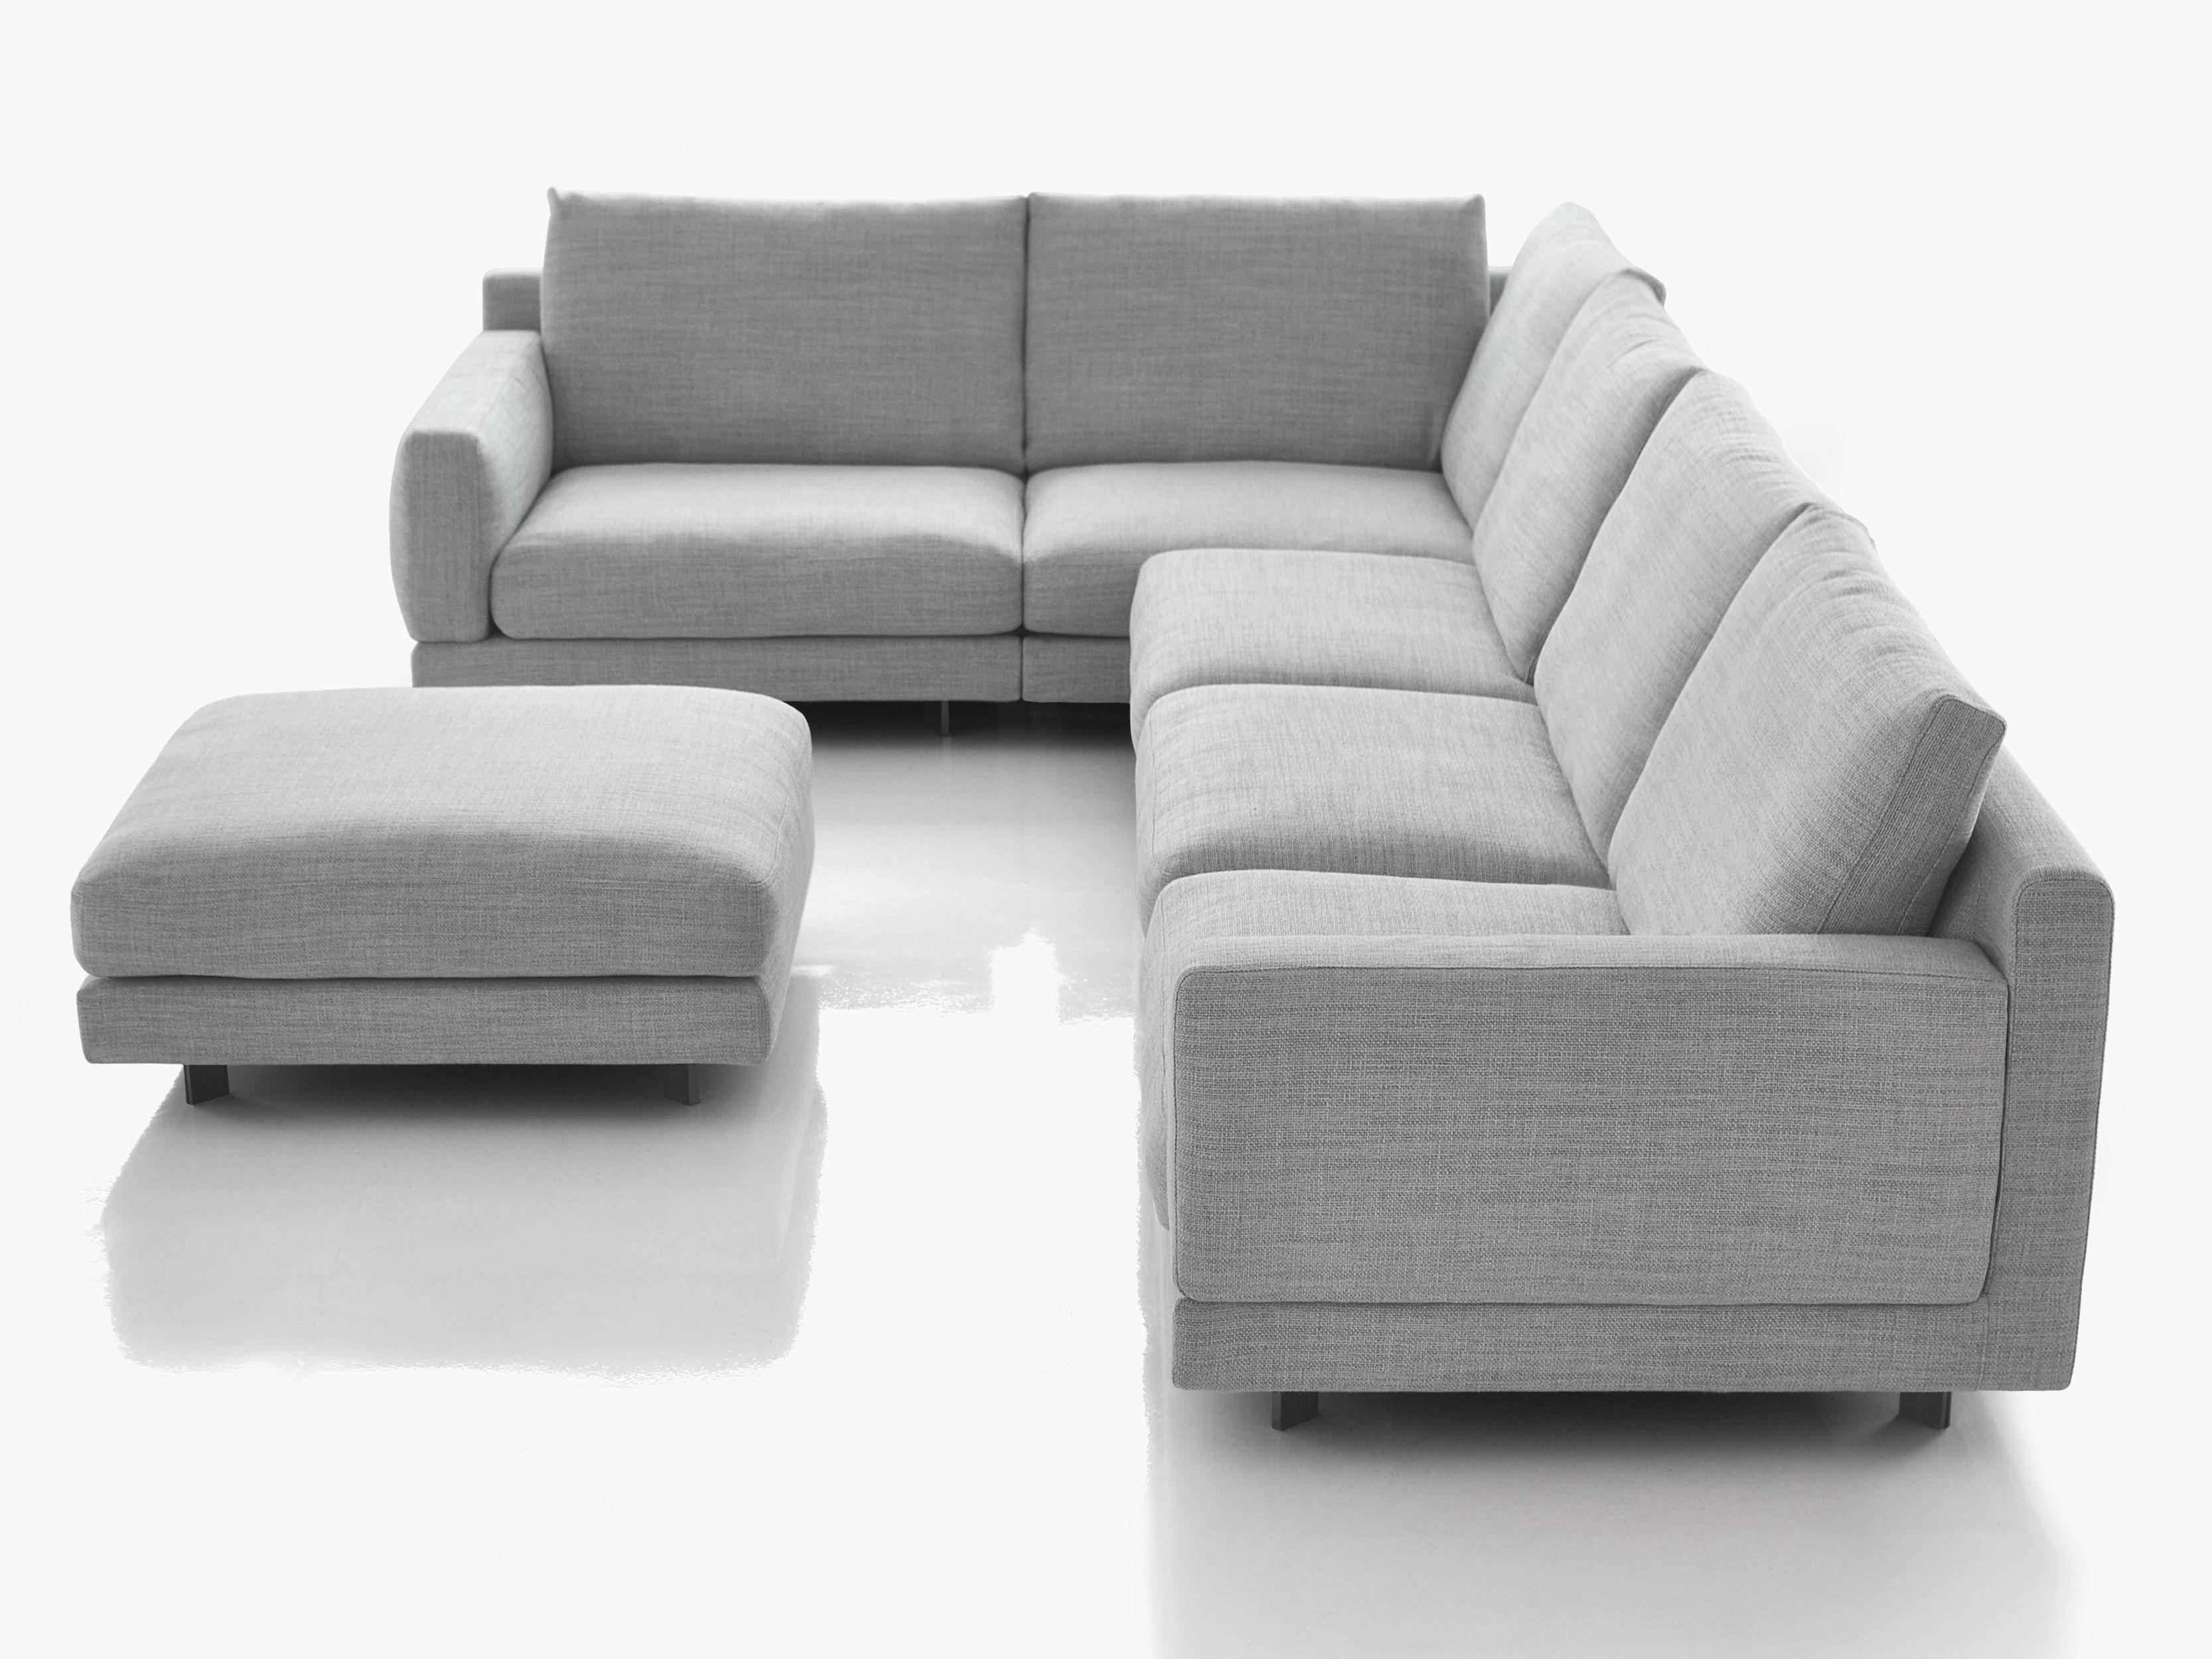 stunning divano a elle images